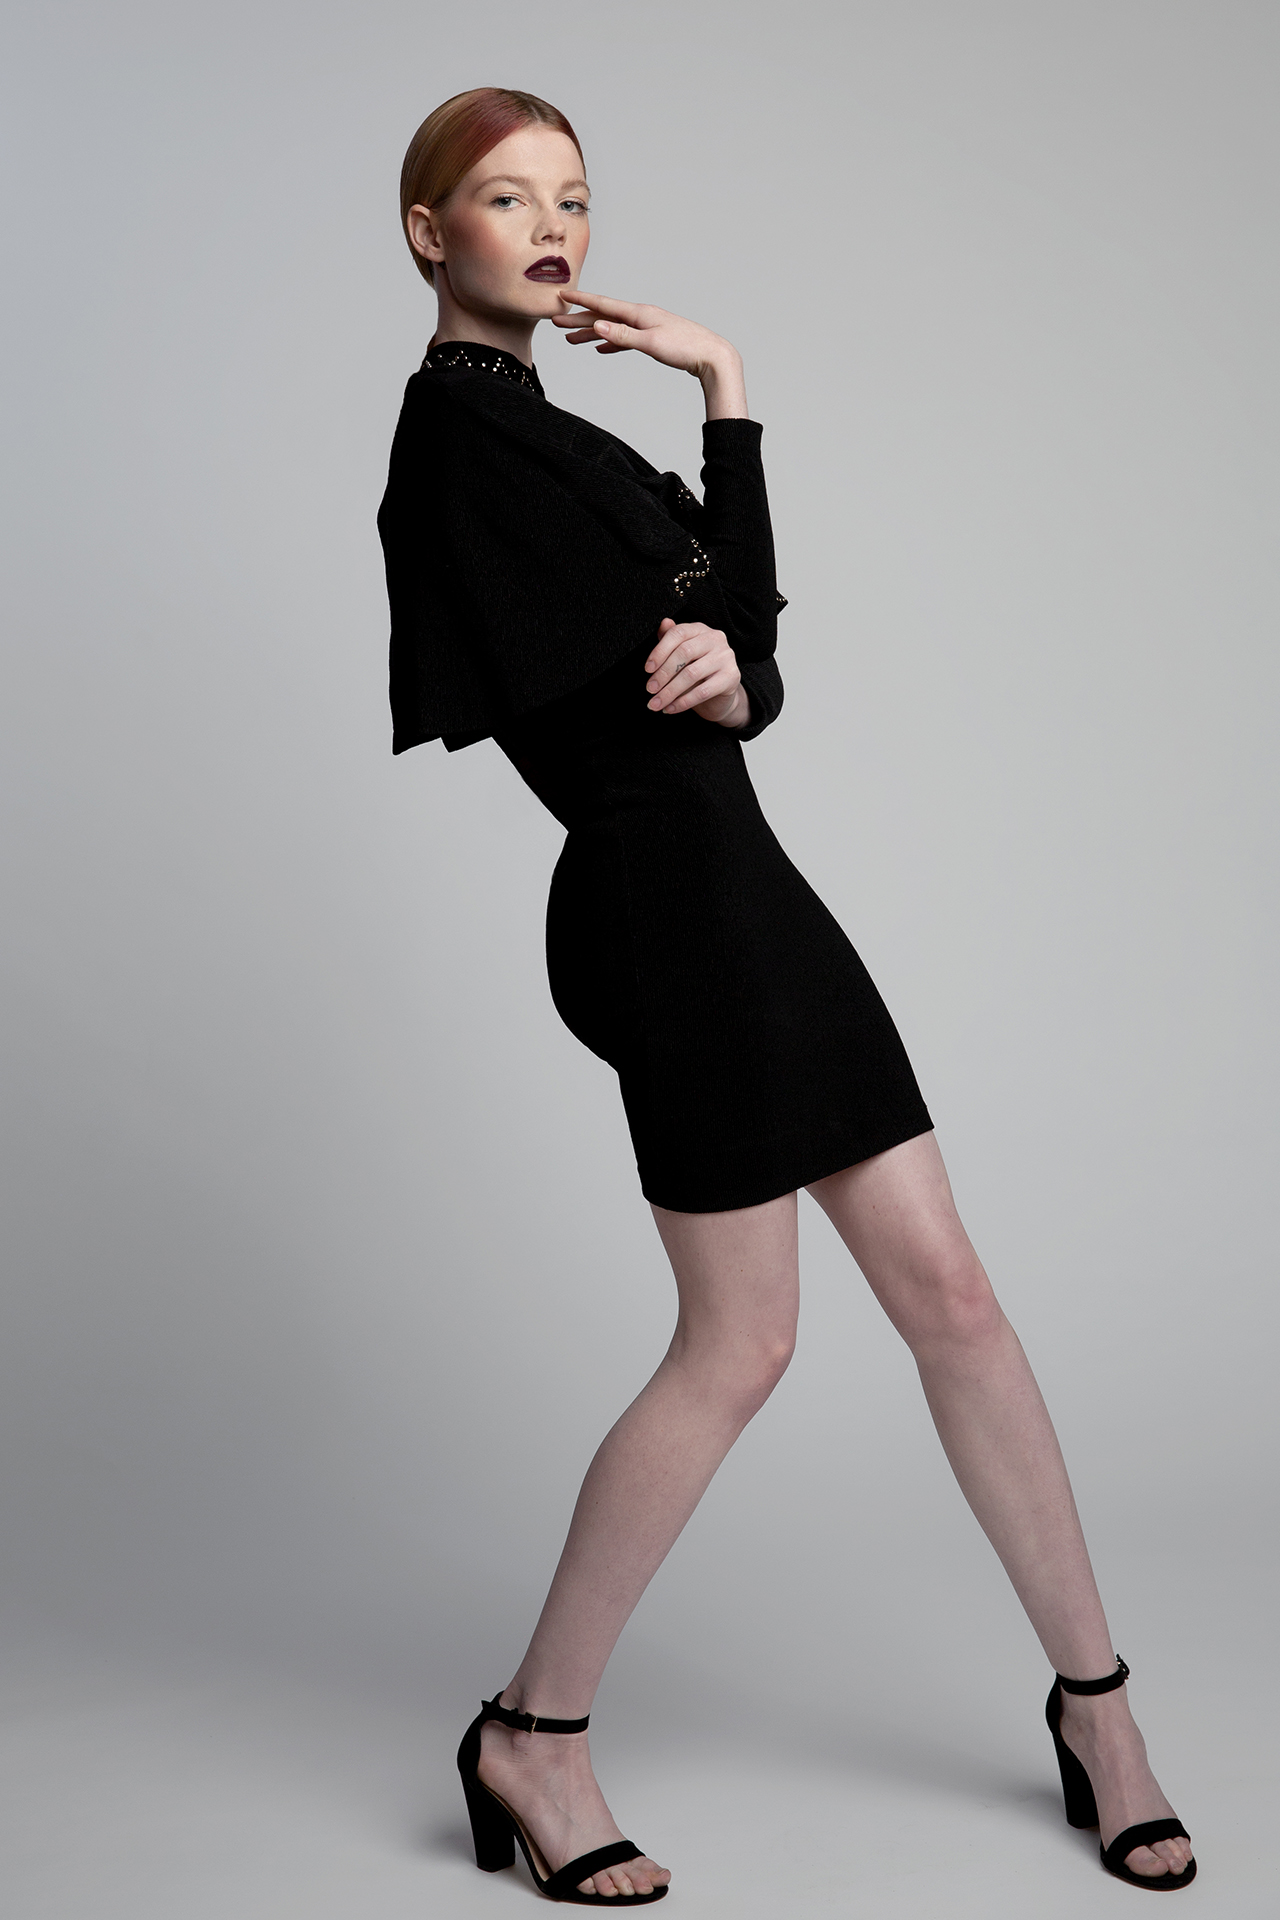 mark_and_naomi_toronto_fashion_photographery_david_dunkley_black_tie_vii.jpg